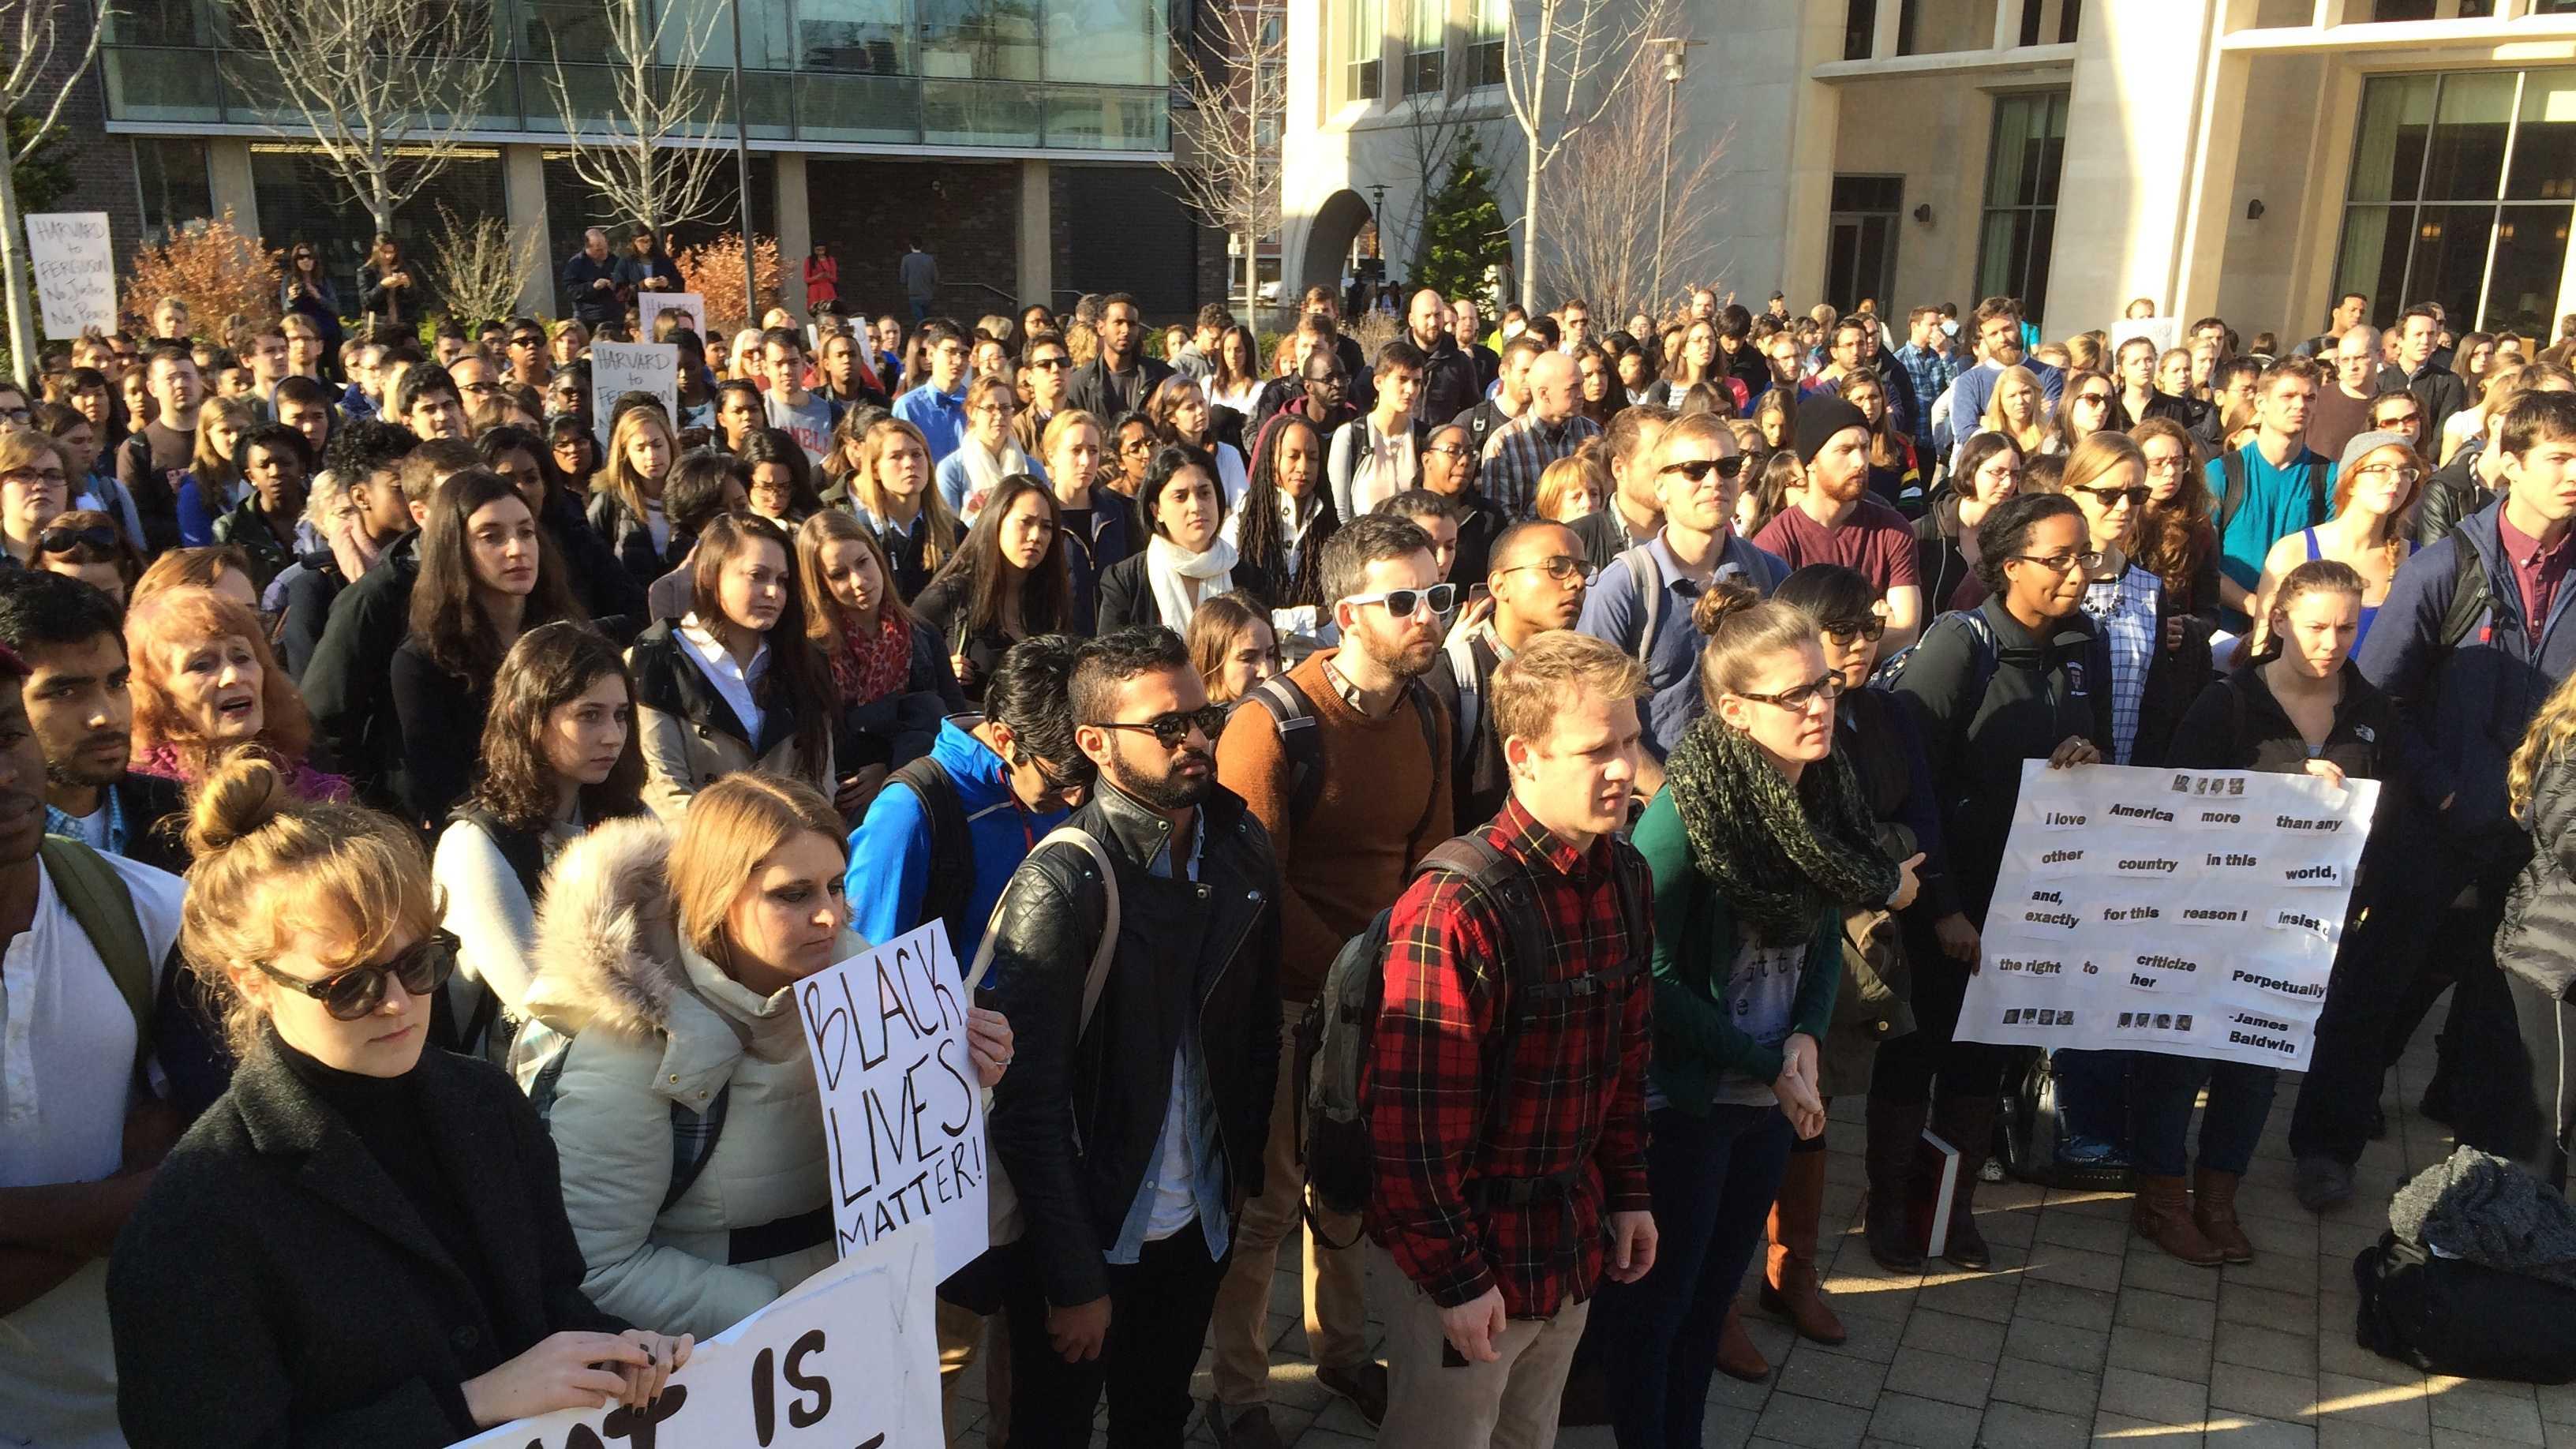 Harvard Ferguson protest